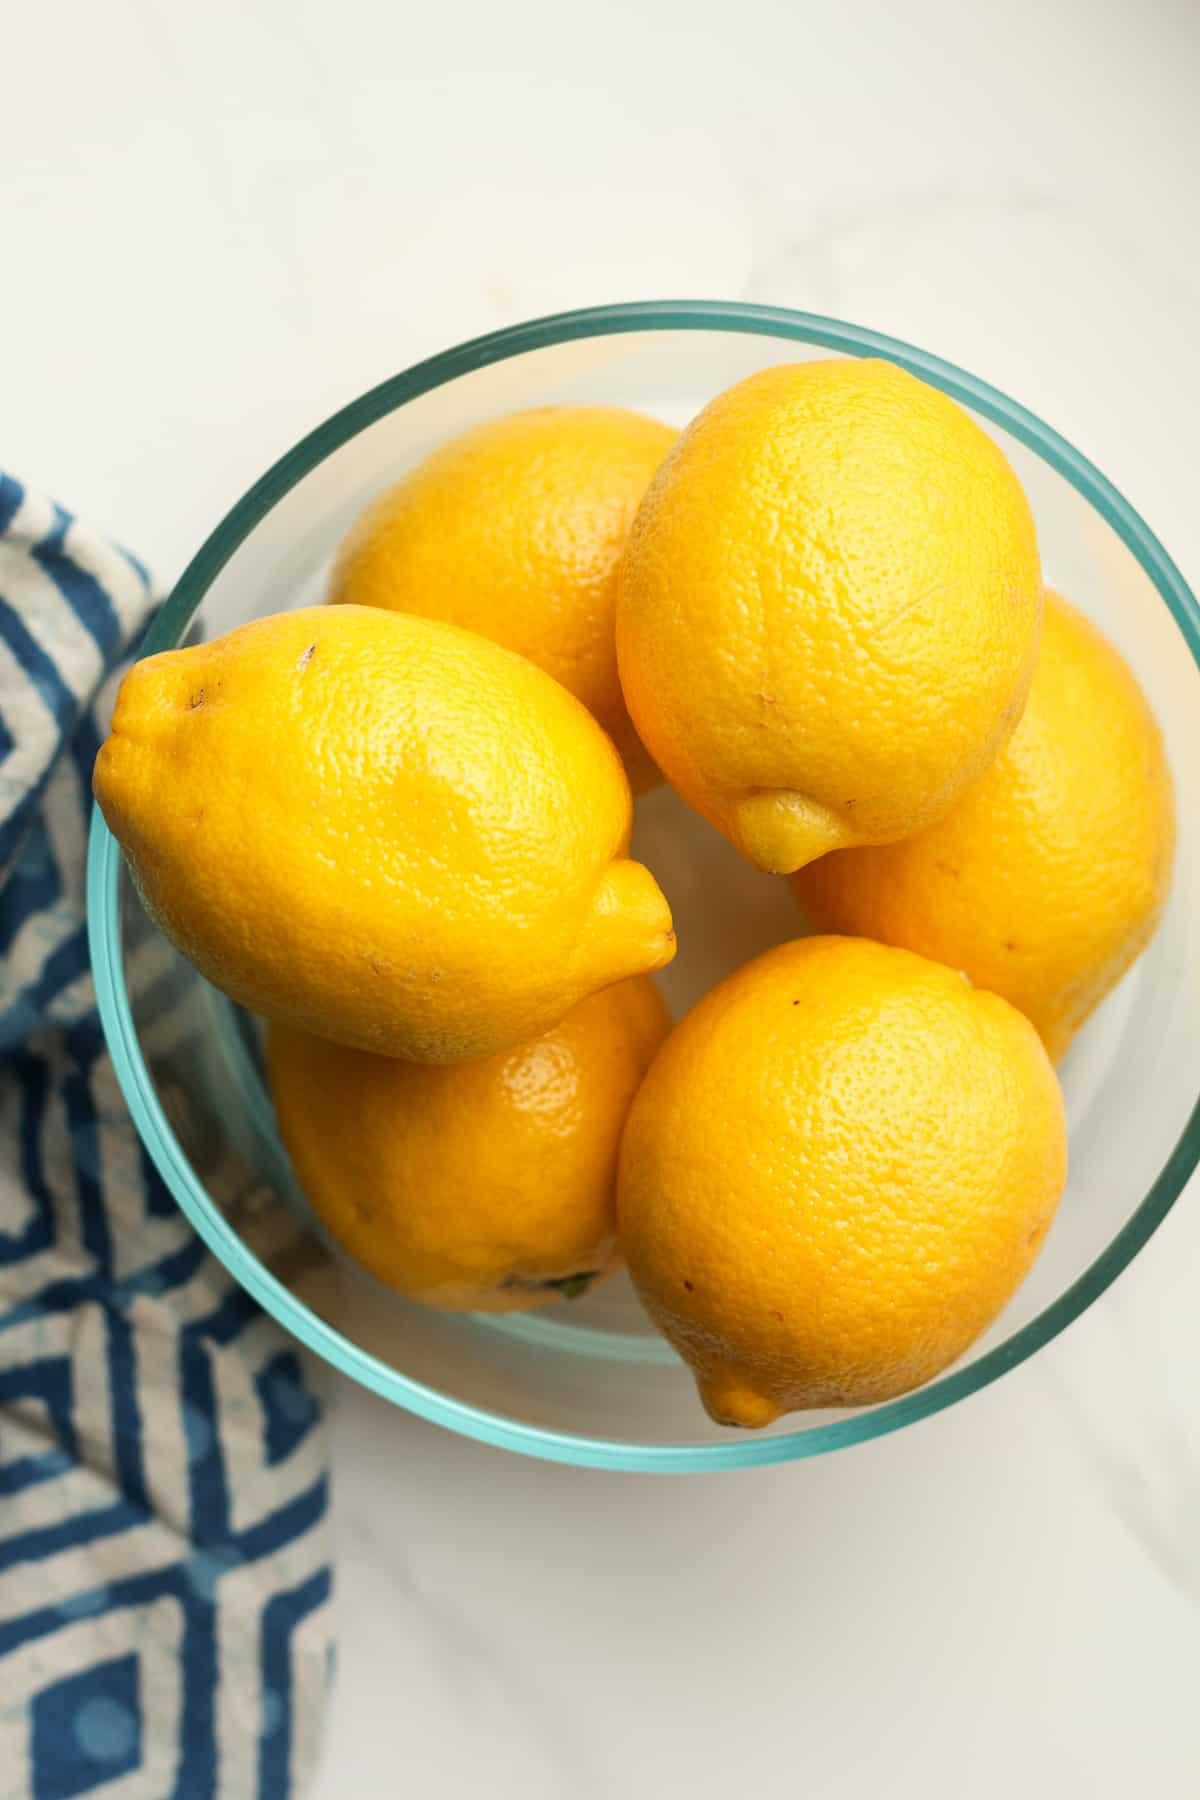 A bowl of lemons.